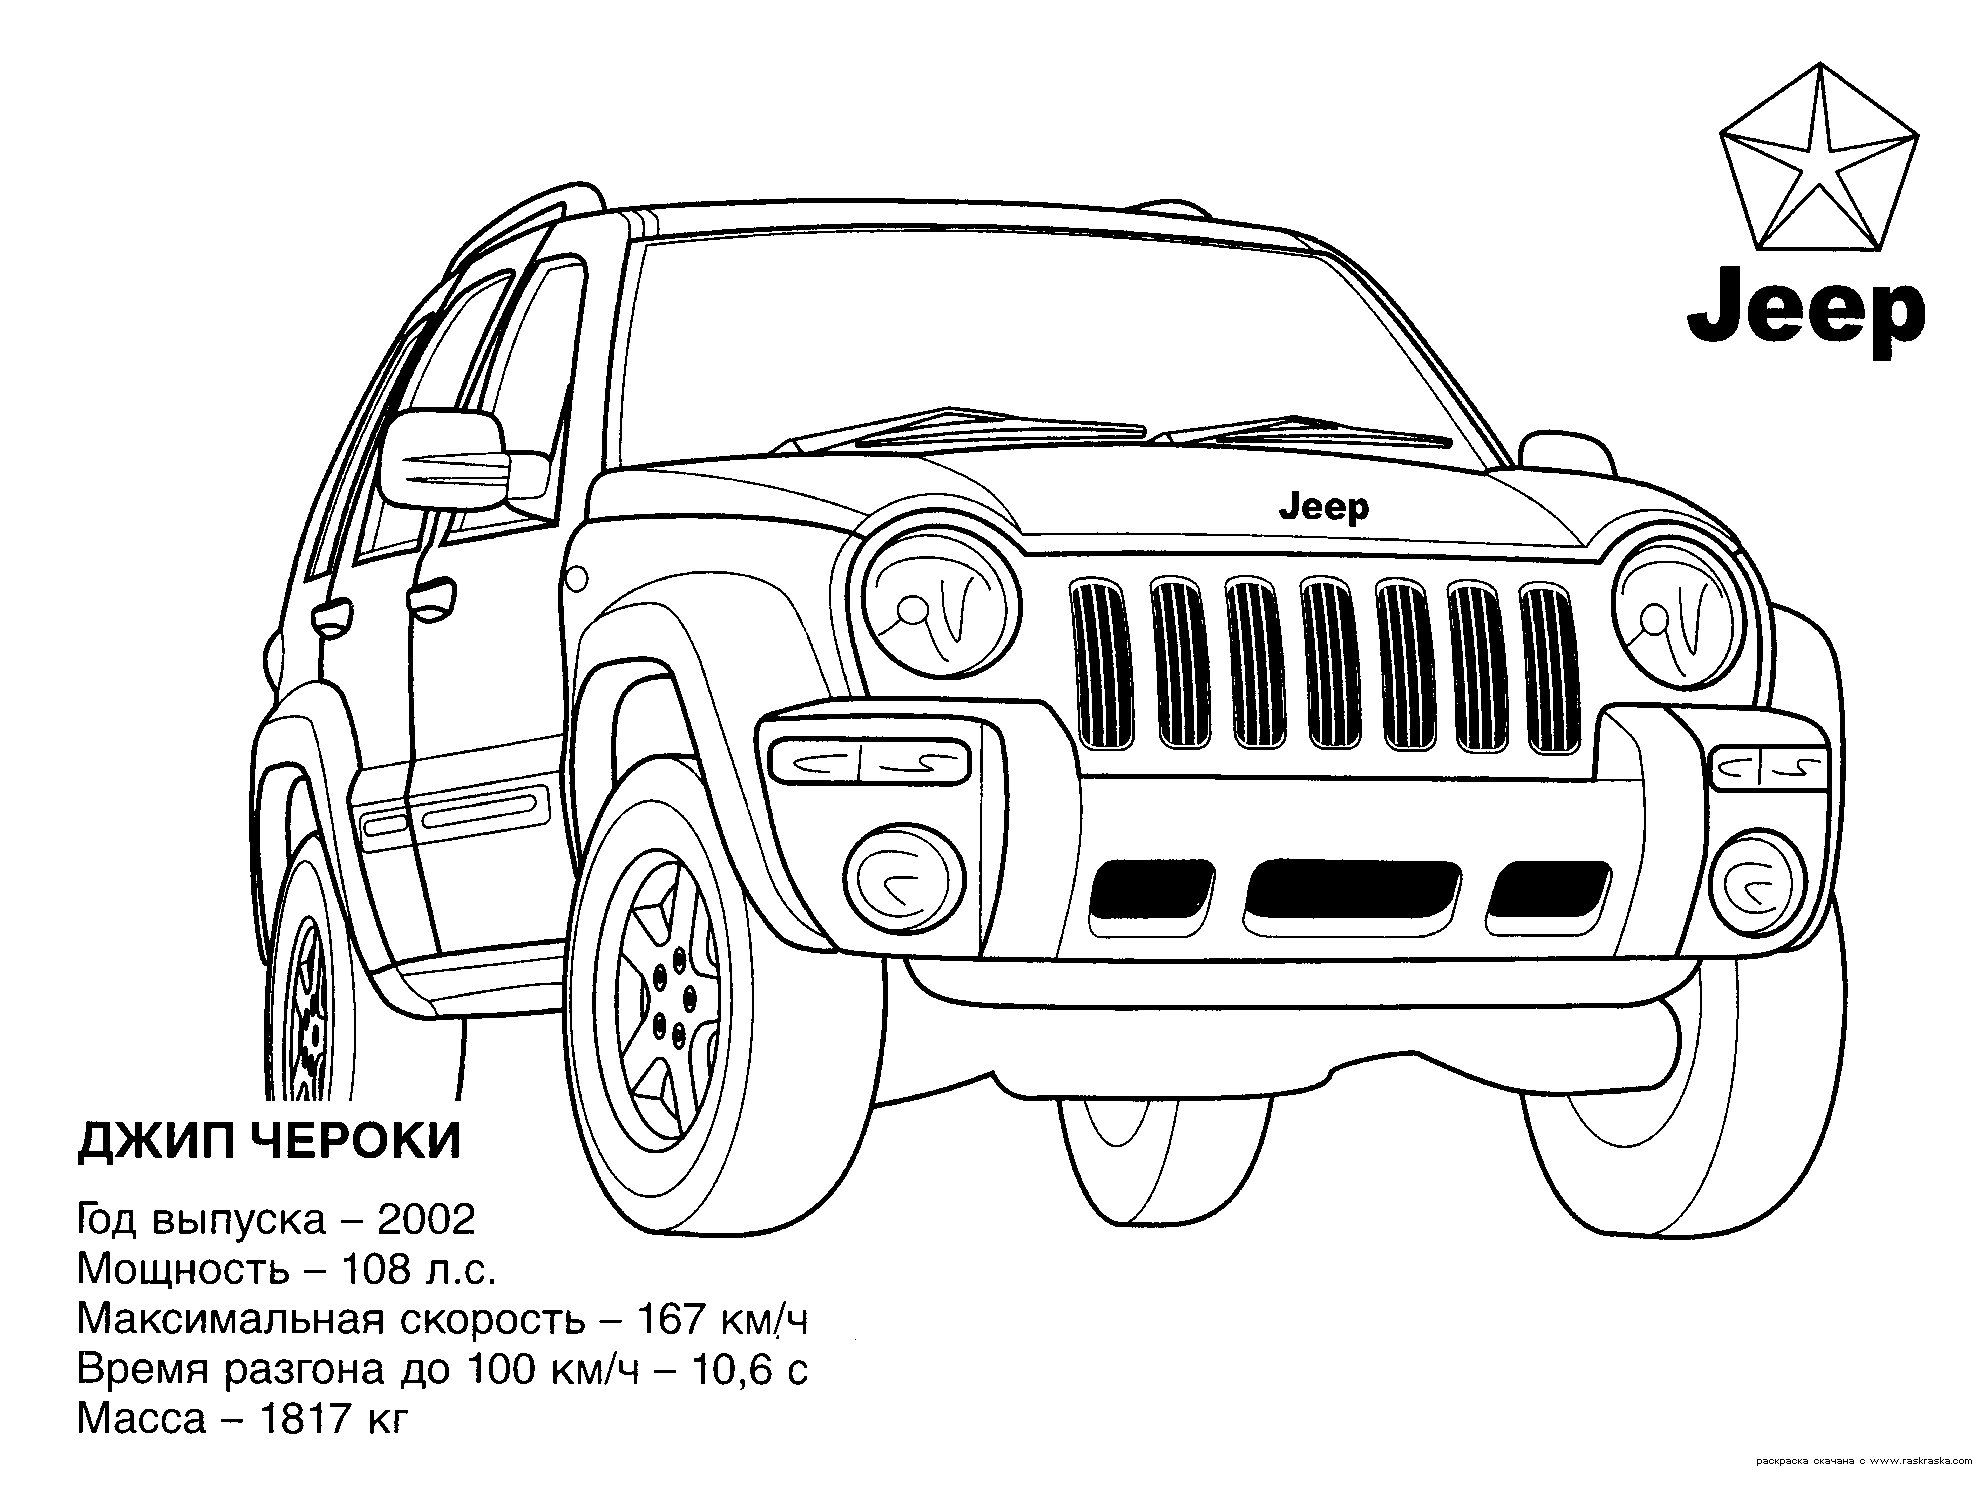 cartoon jeep cherokee drawings - Google Search | Jeep ...